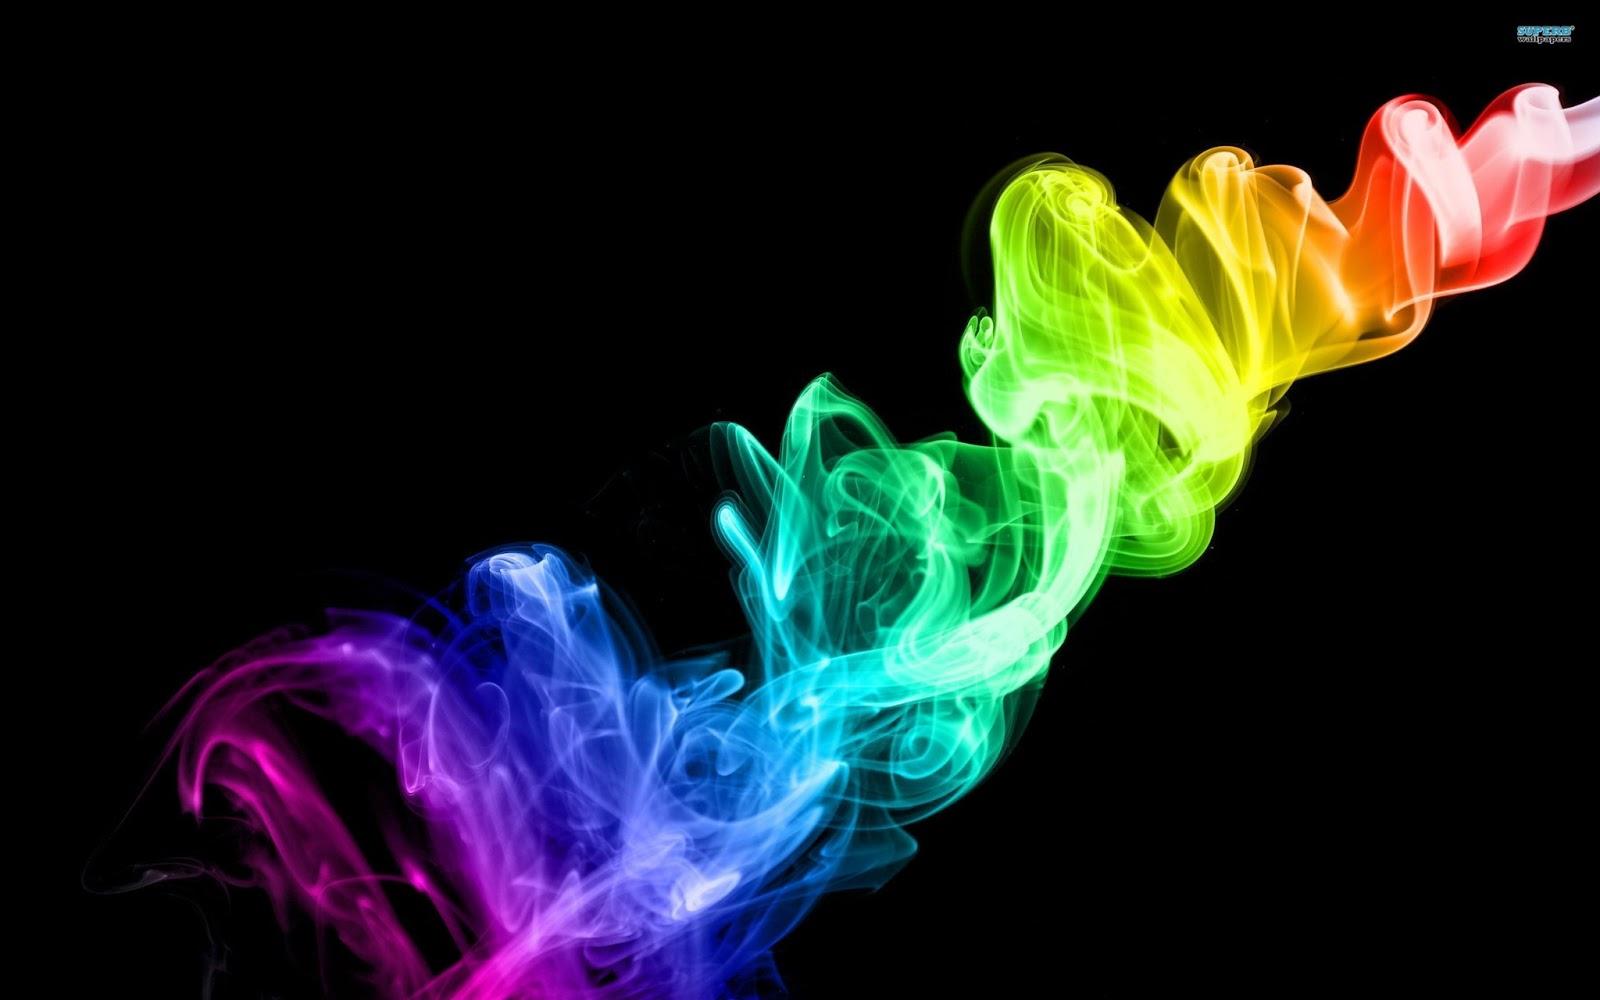 Colorful Smoke HD Wallpapers